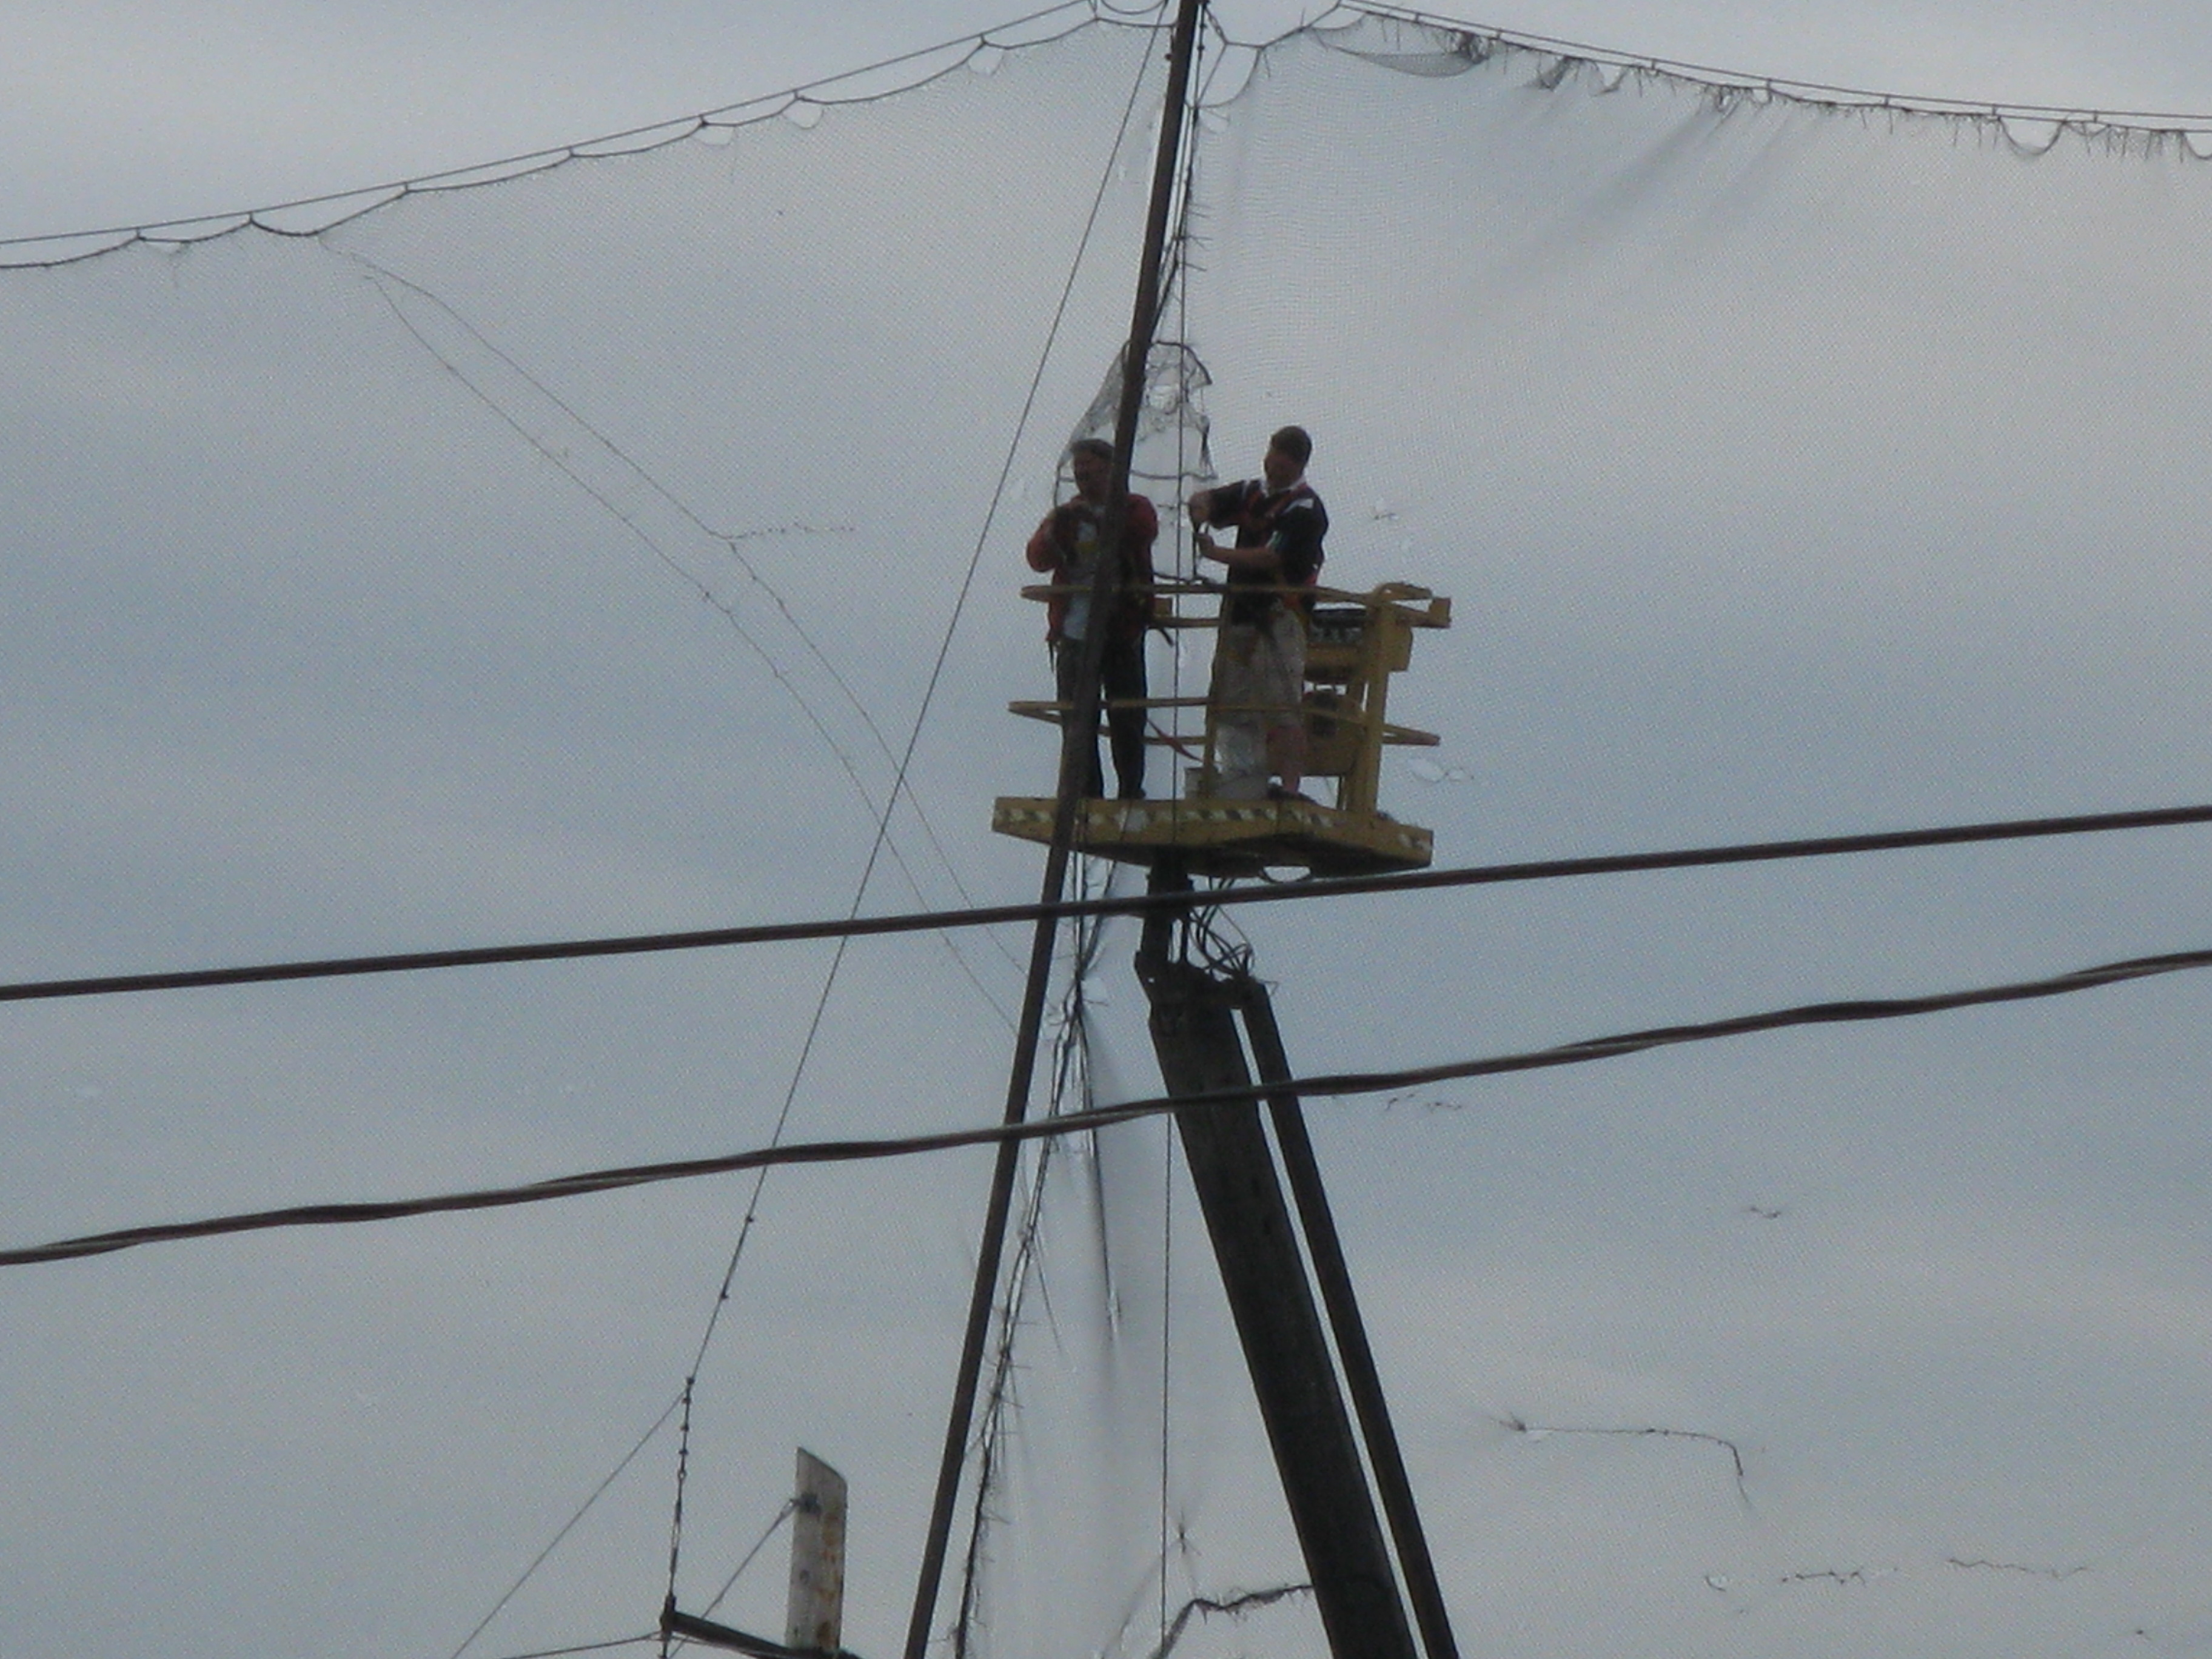 Repairing a net at a golf driving range -d.jpg photo